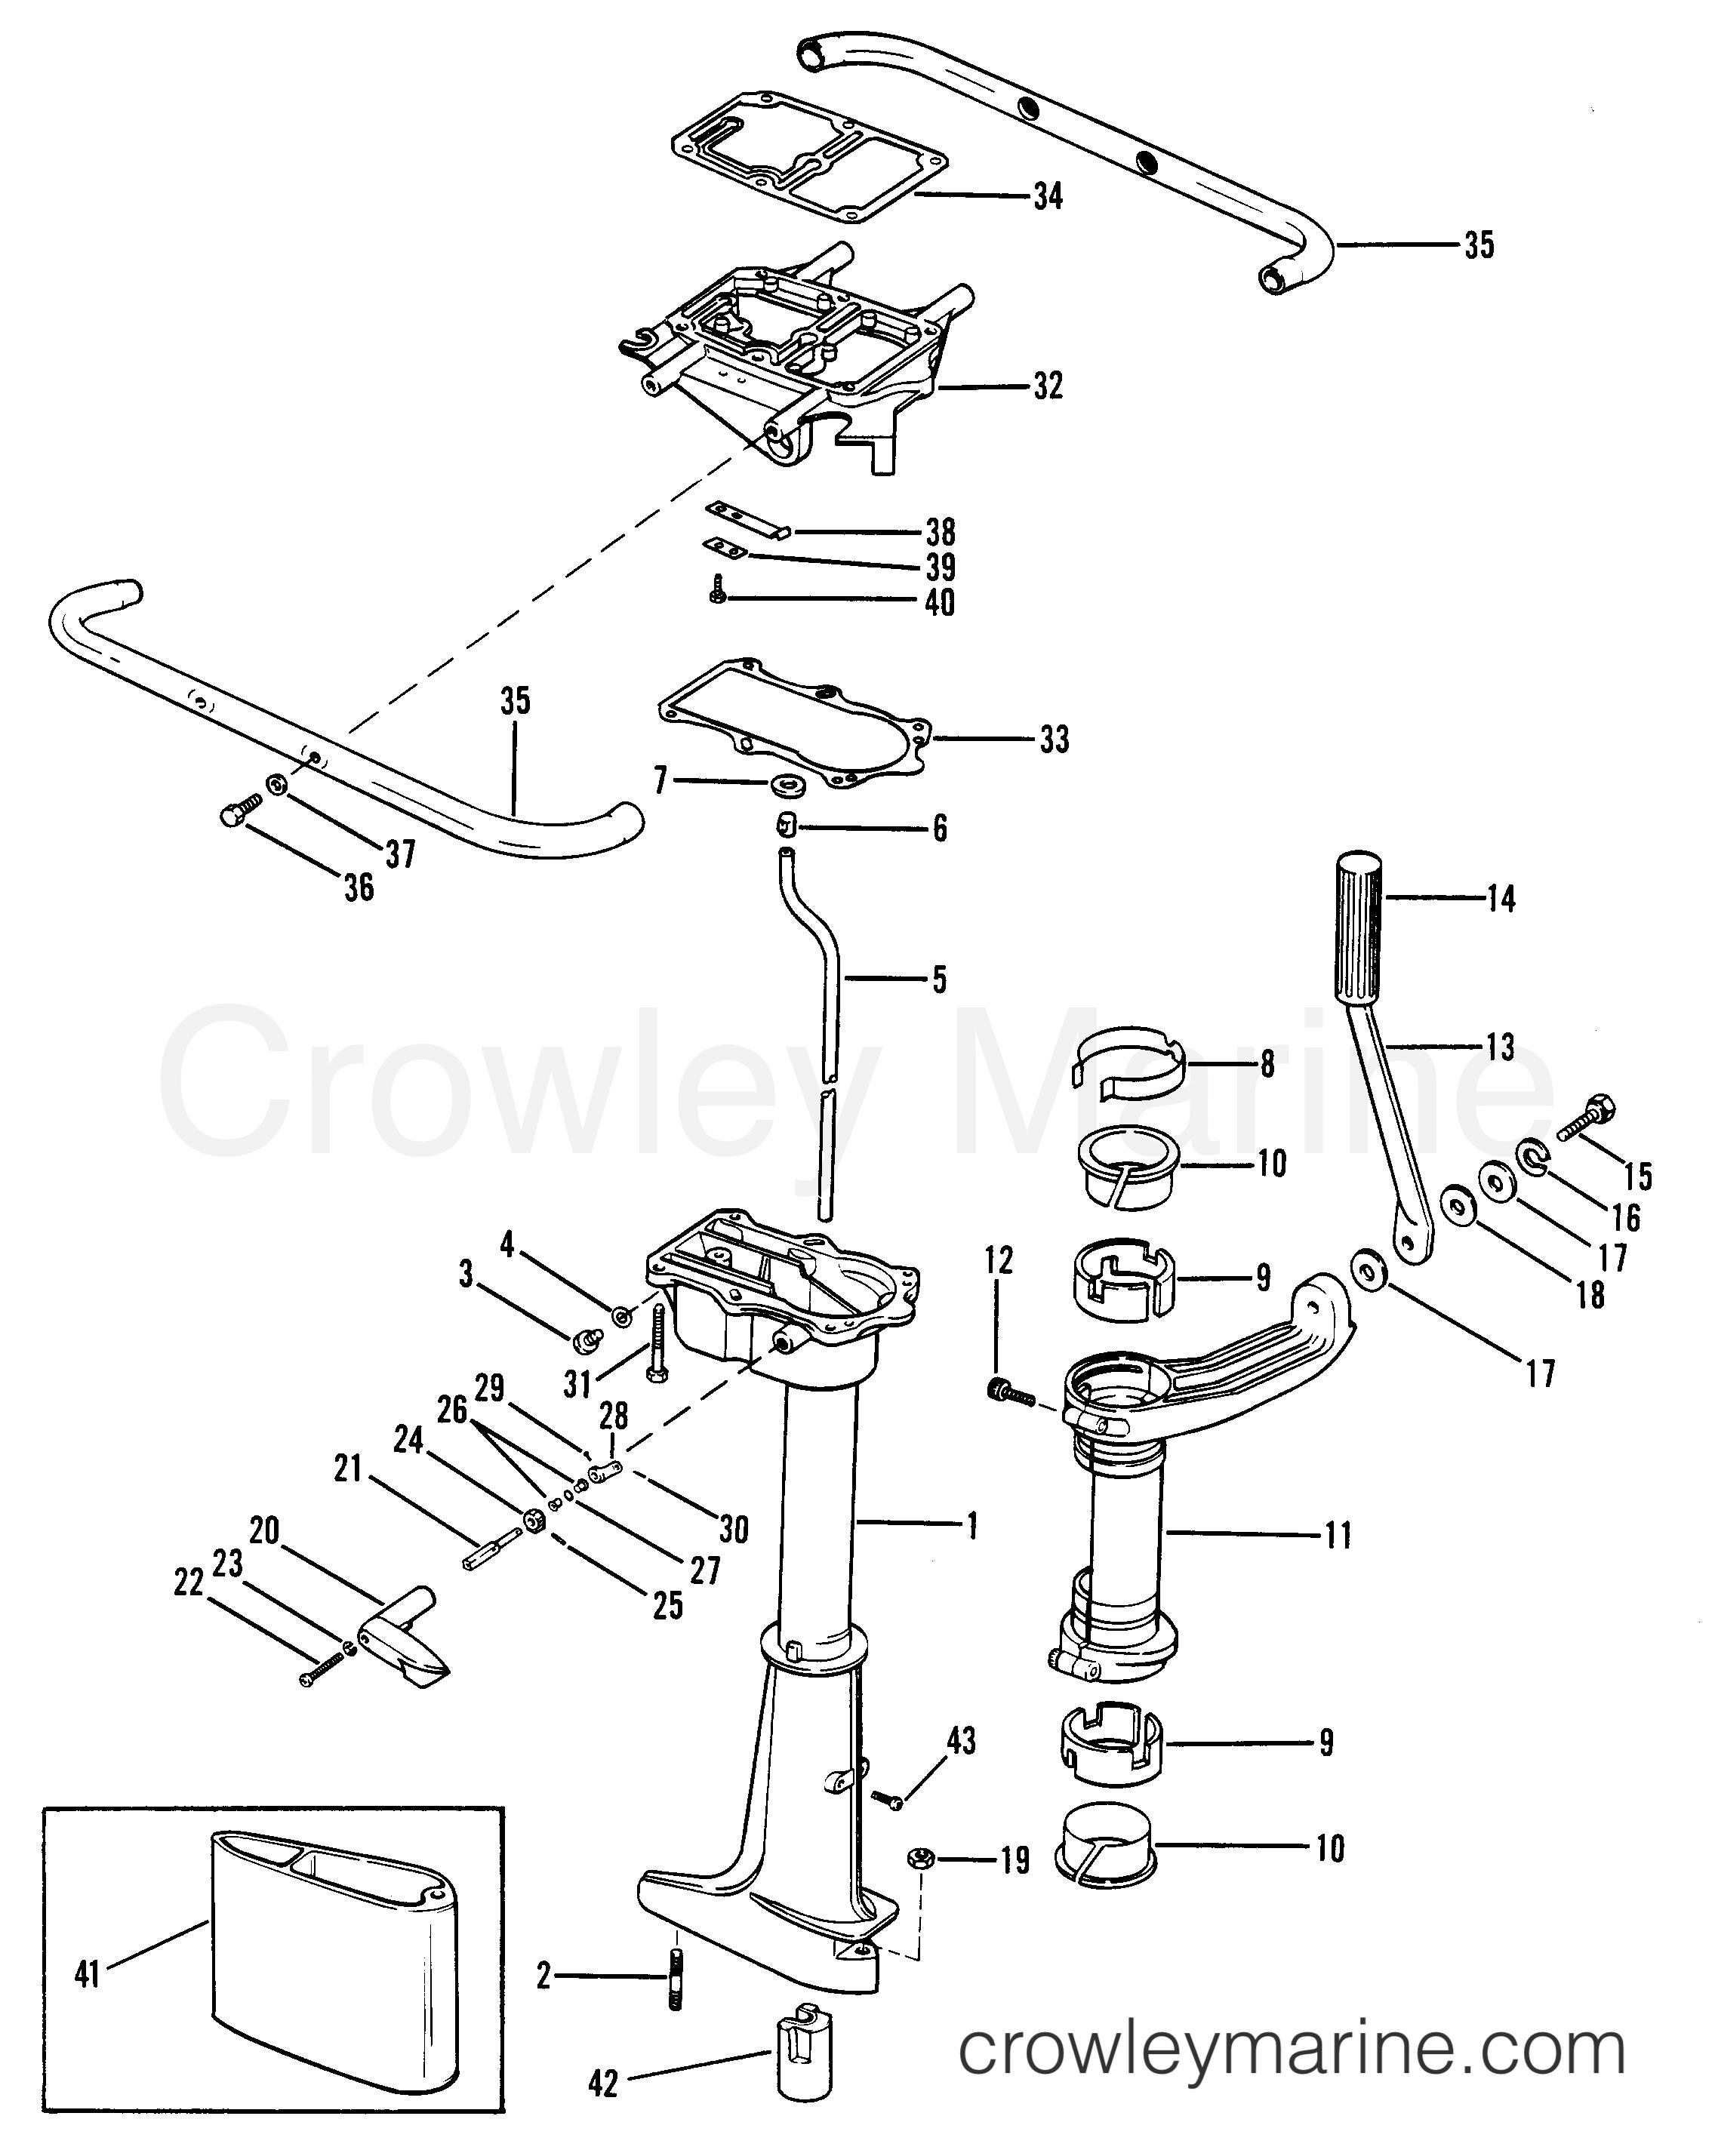 Diagram Of 1983 Mercury Marine Mercury Outboard 1050203 Drive Shaft